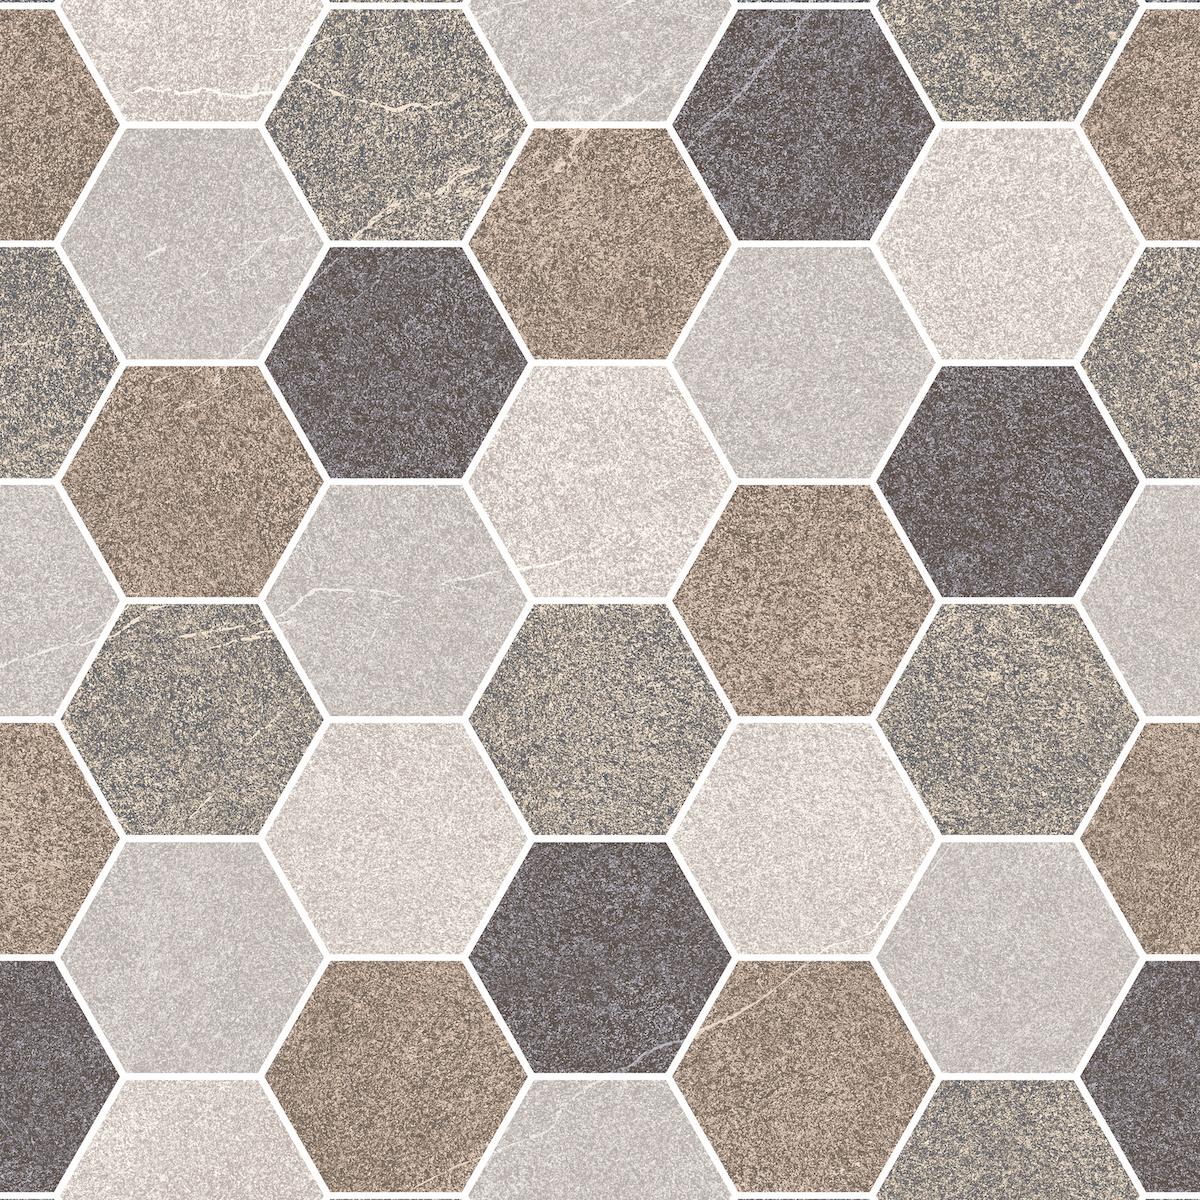 HRP Stone Hexagon Brown Multi